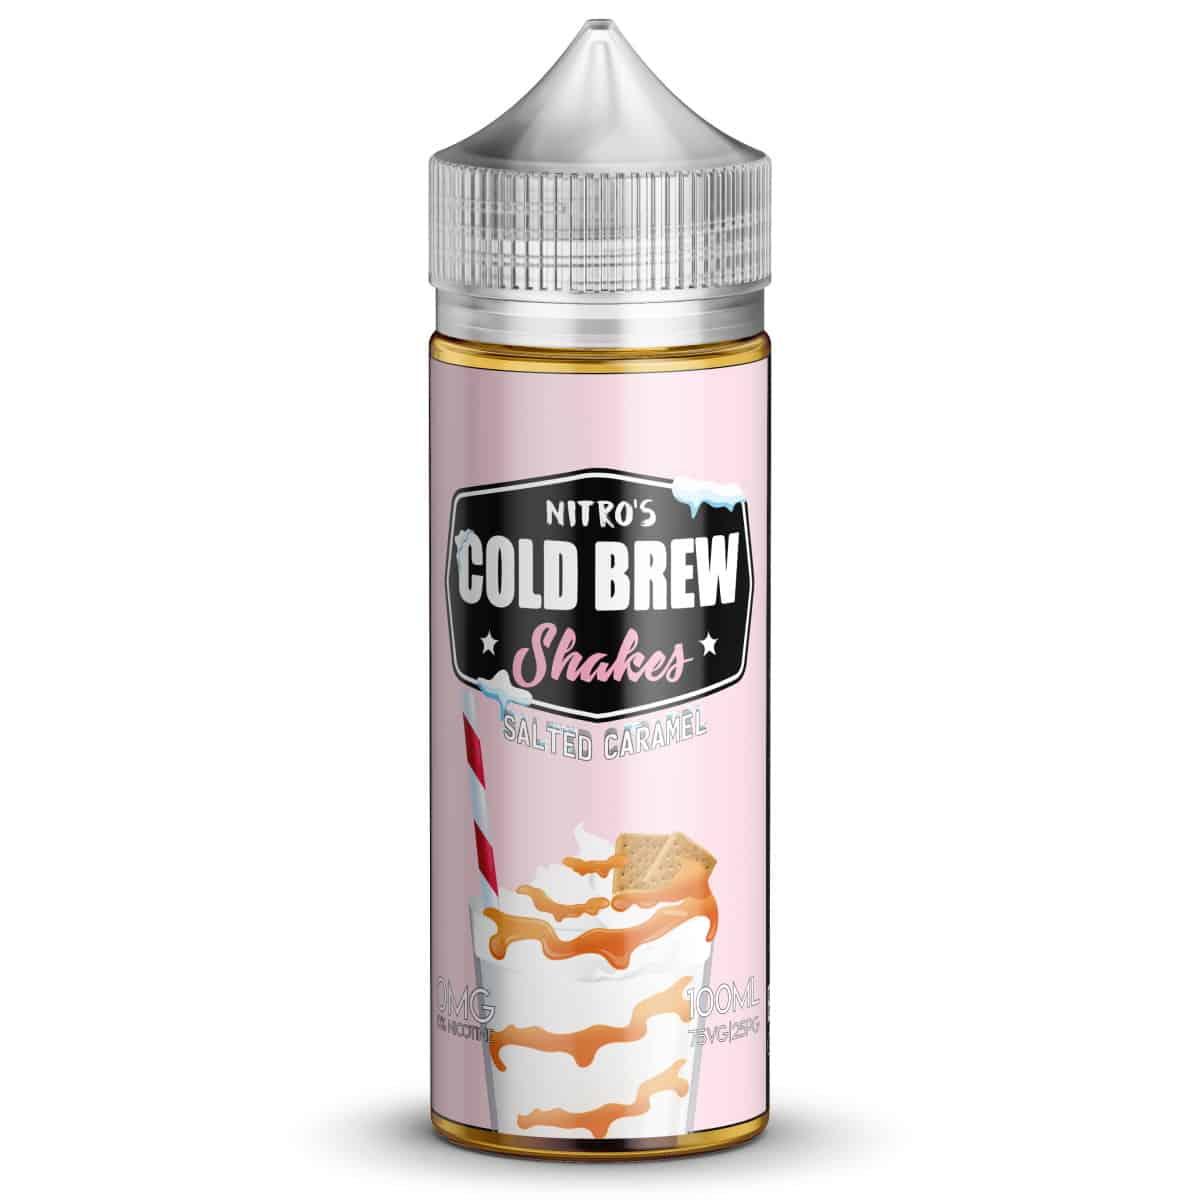 Salted Caramel Nitros Cold Brew Shakes Shortfill 100ml